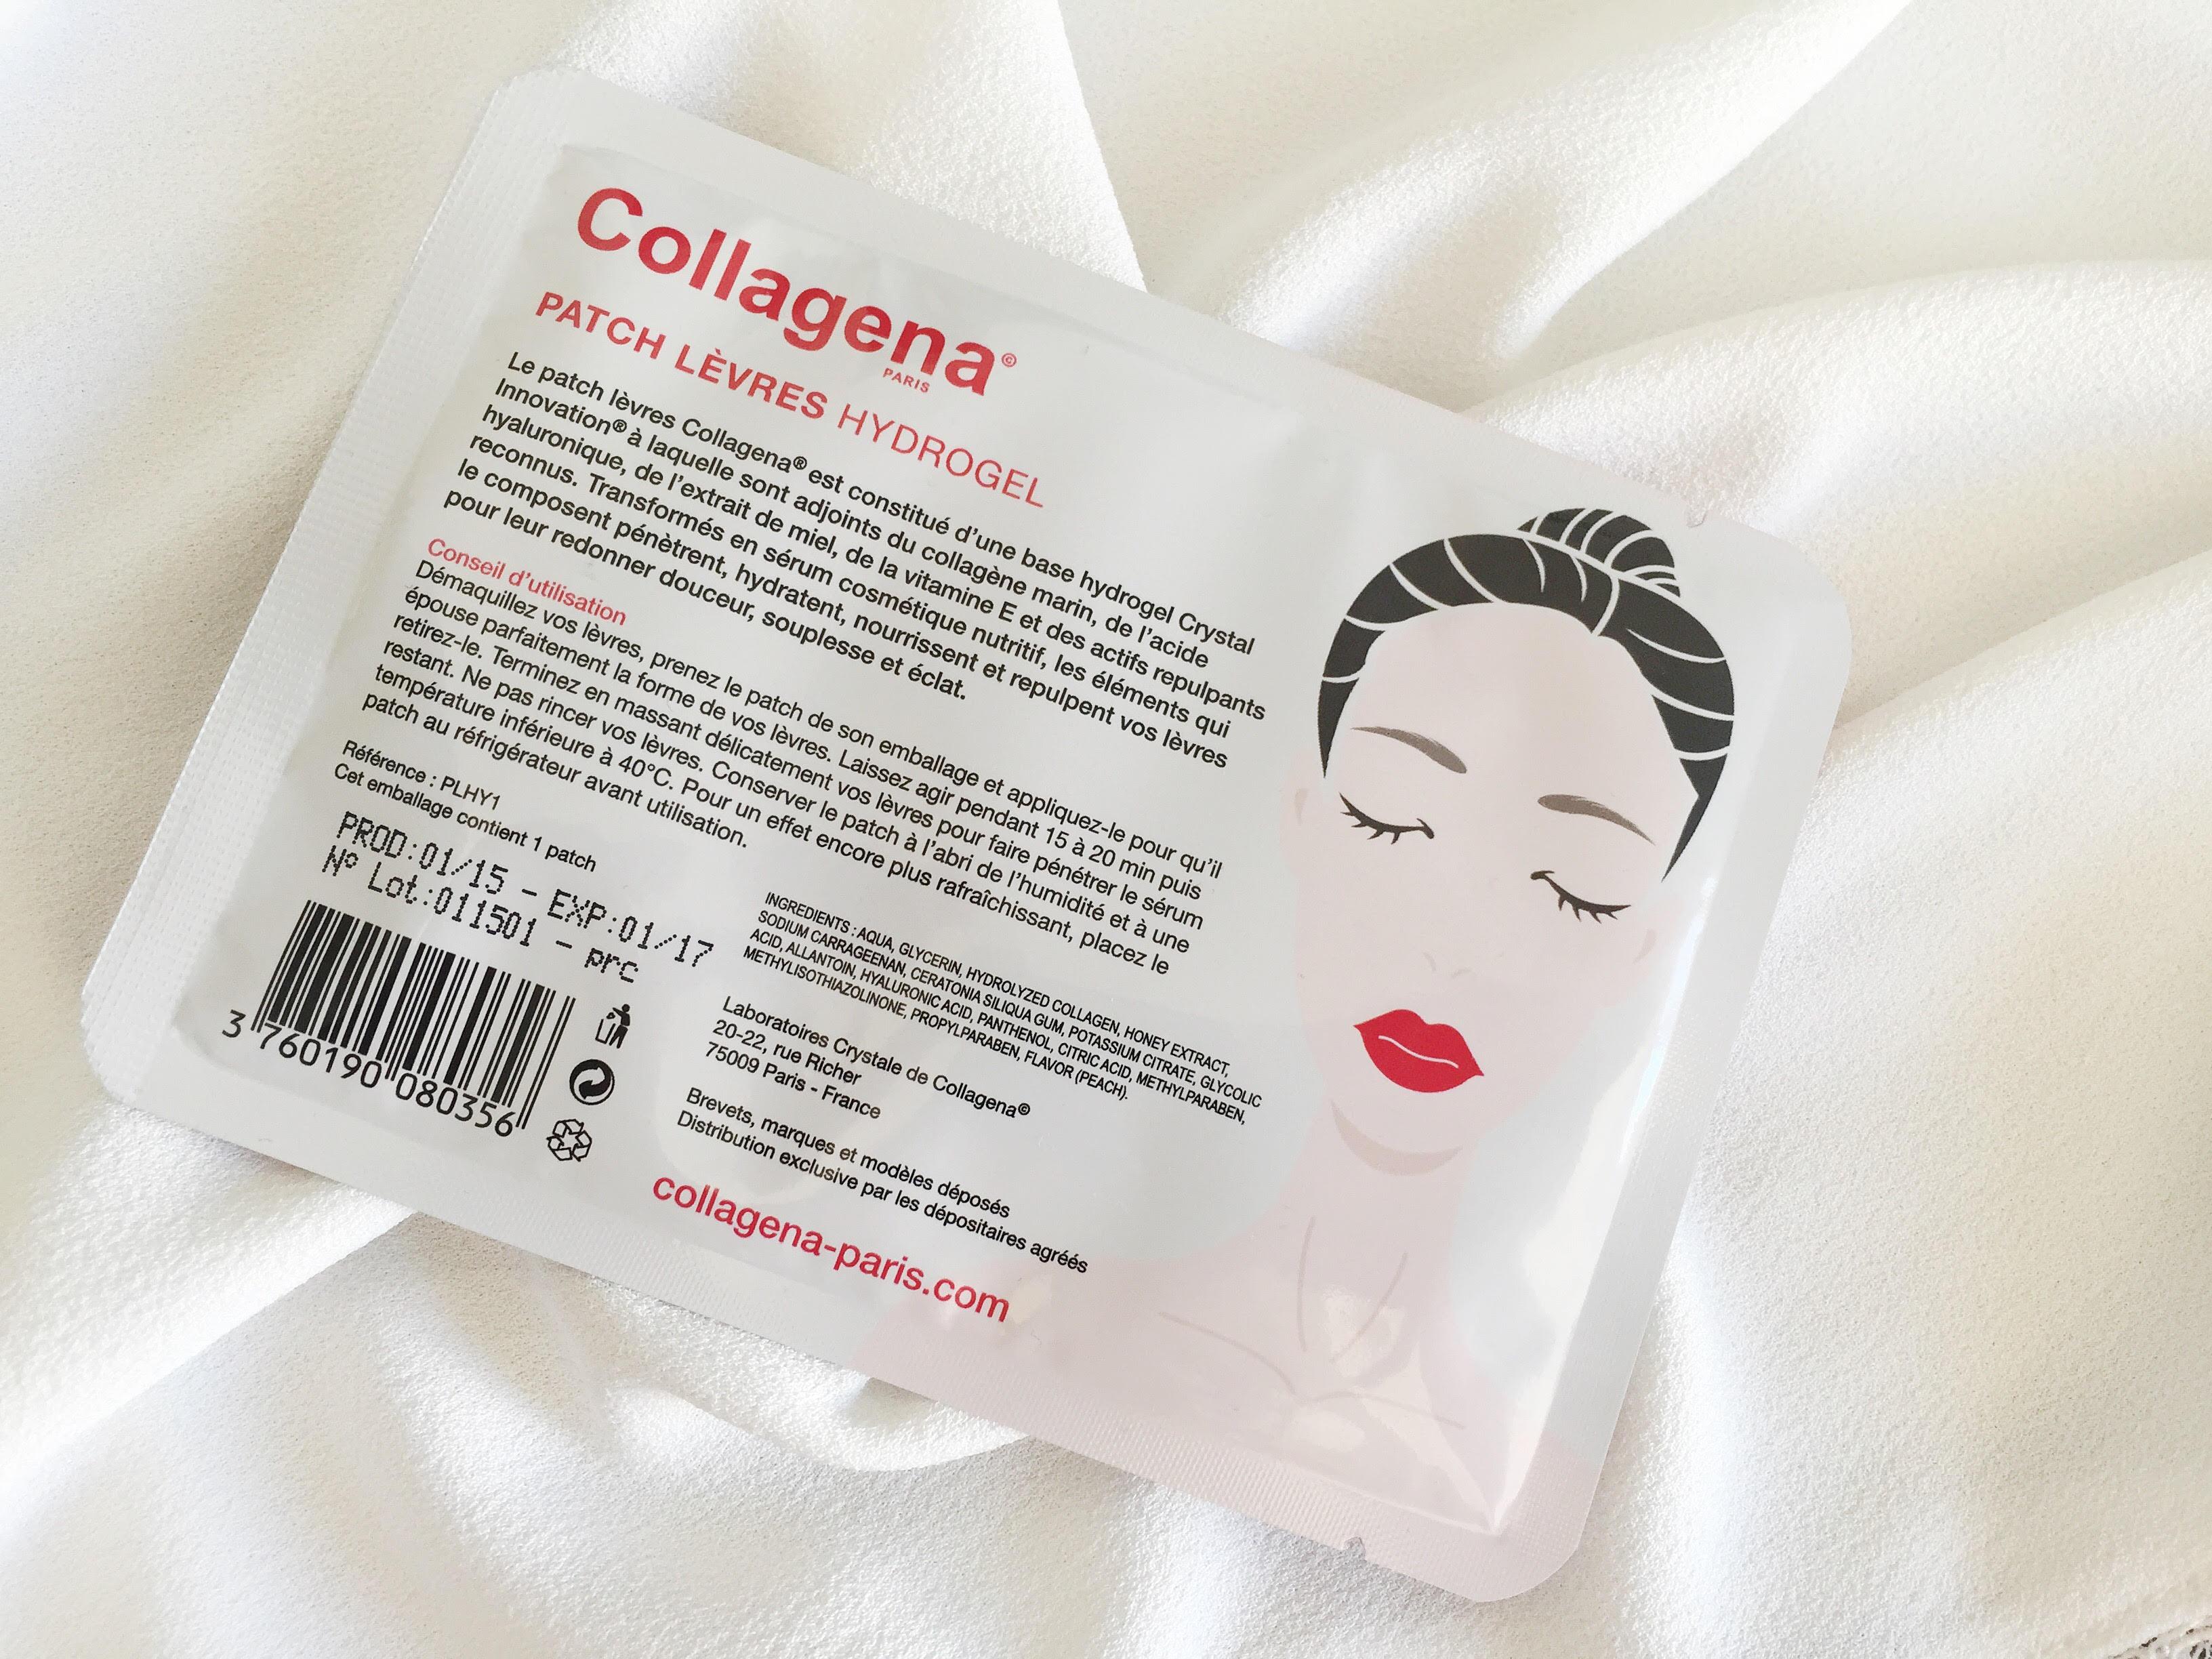 Collagena - 2